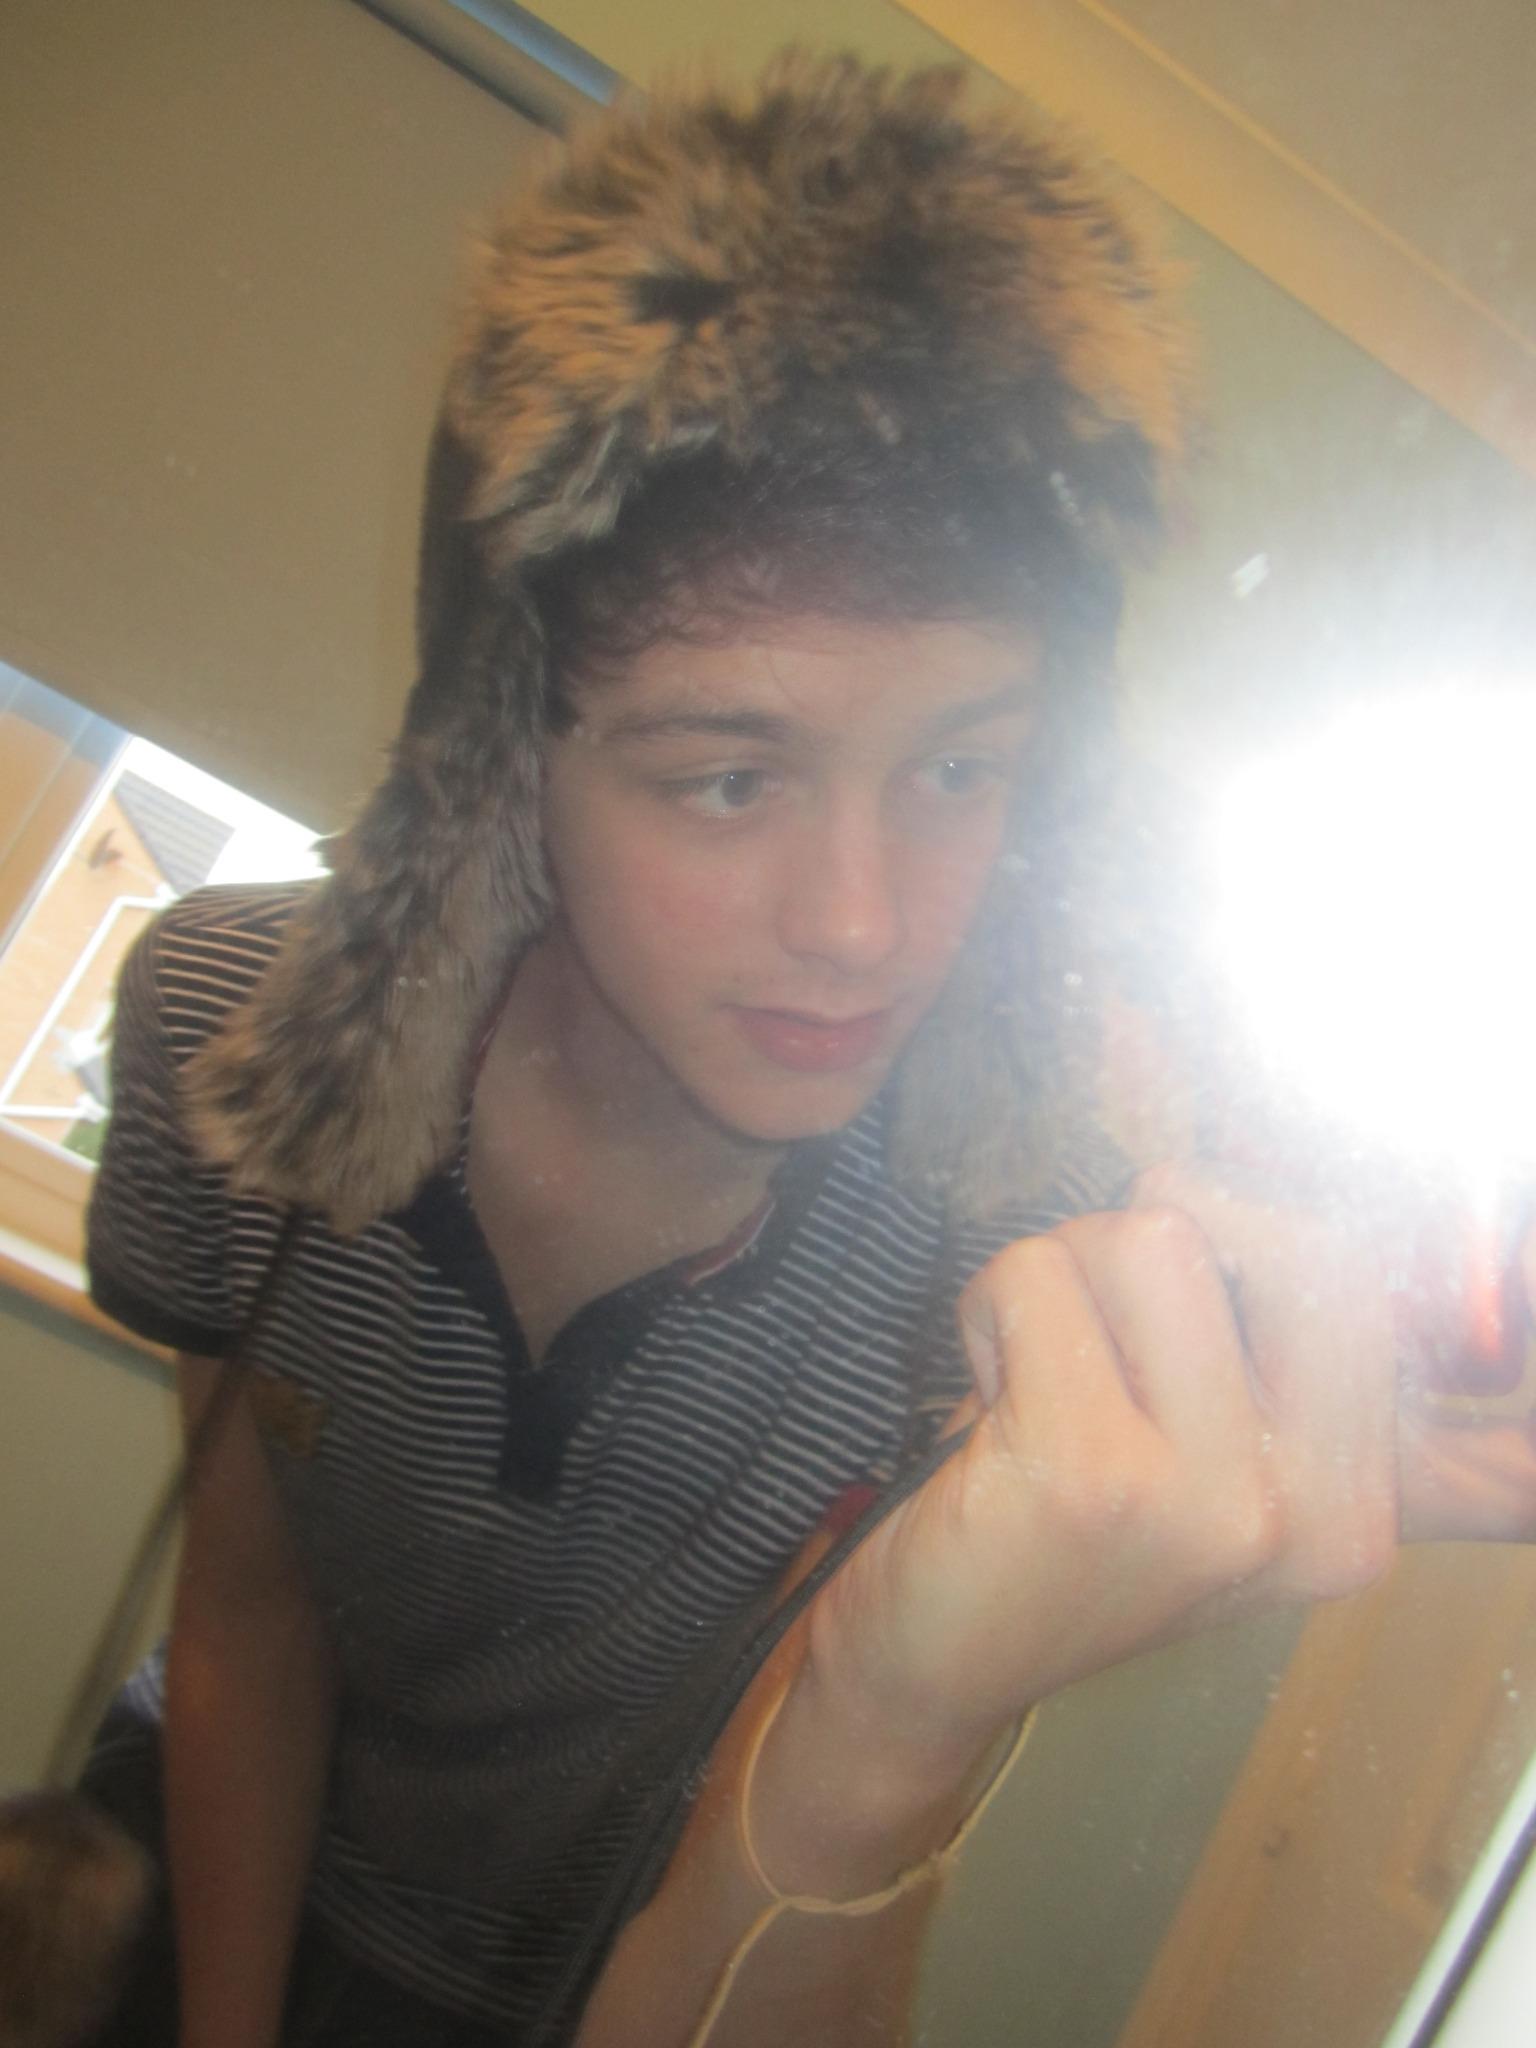 Hi this is me with my cute hat on aw http://t.co/DBds2TEk